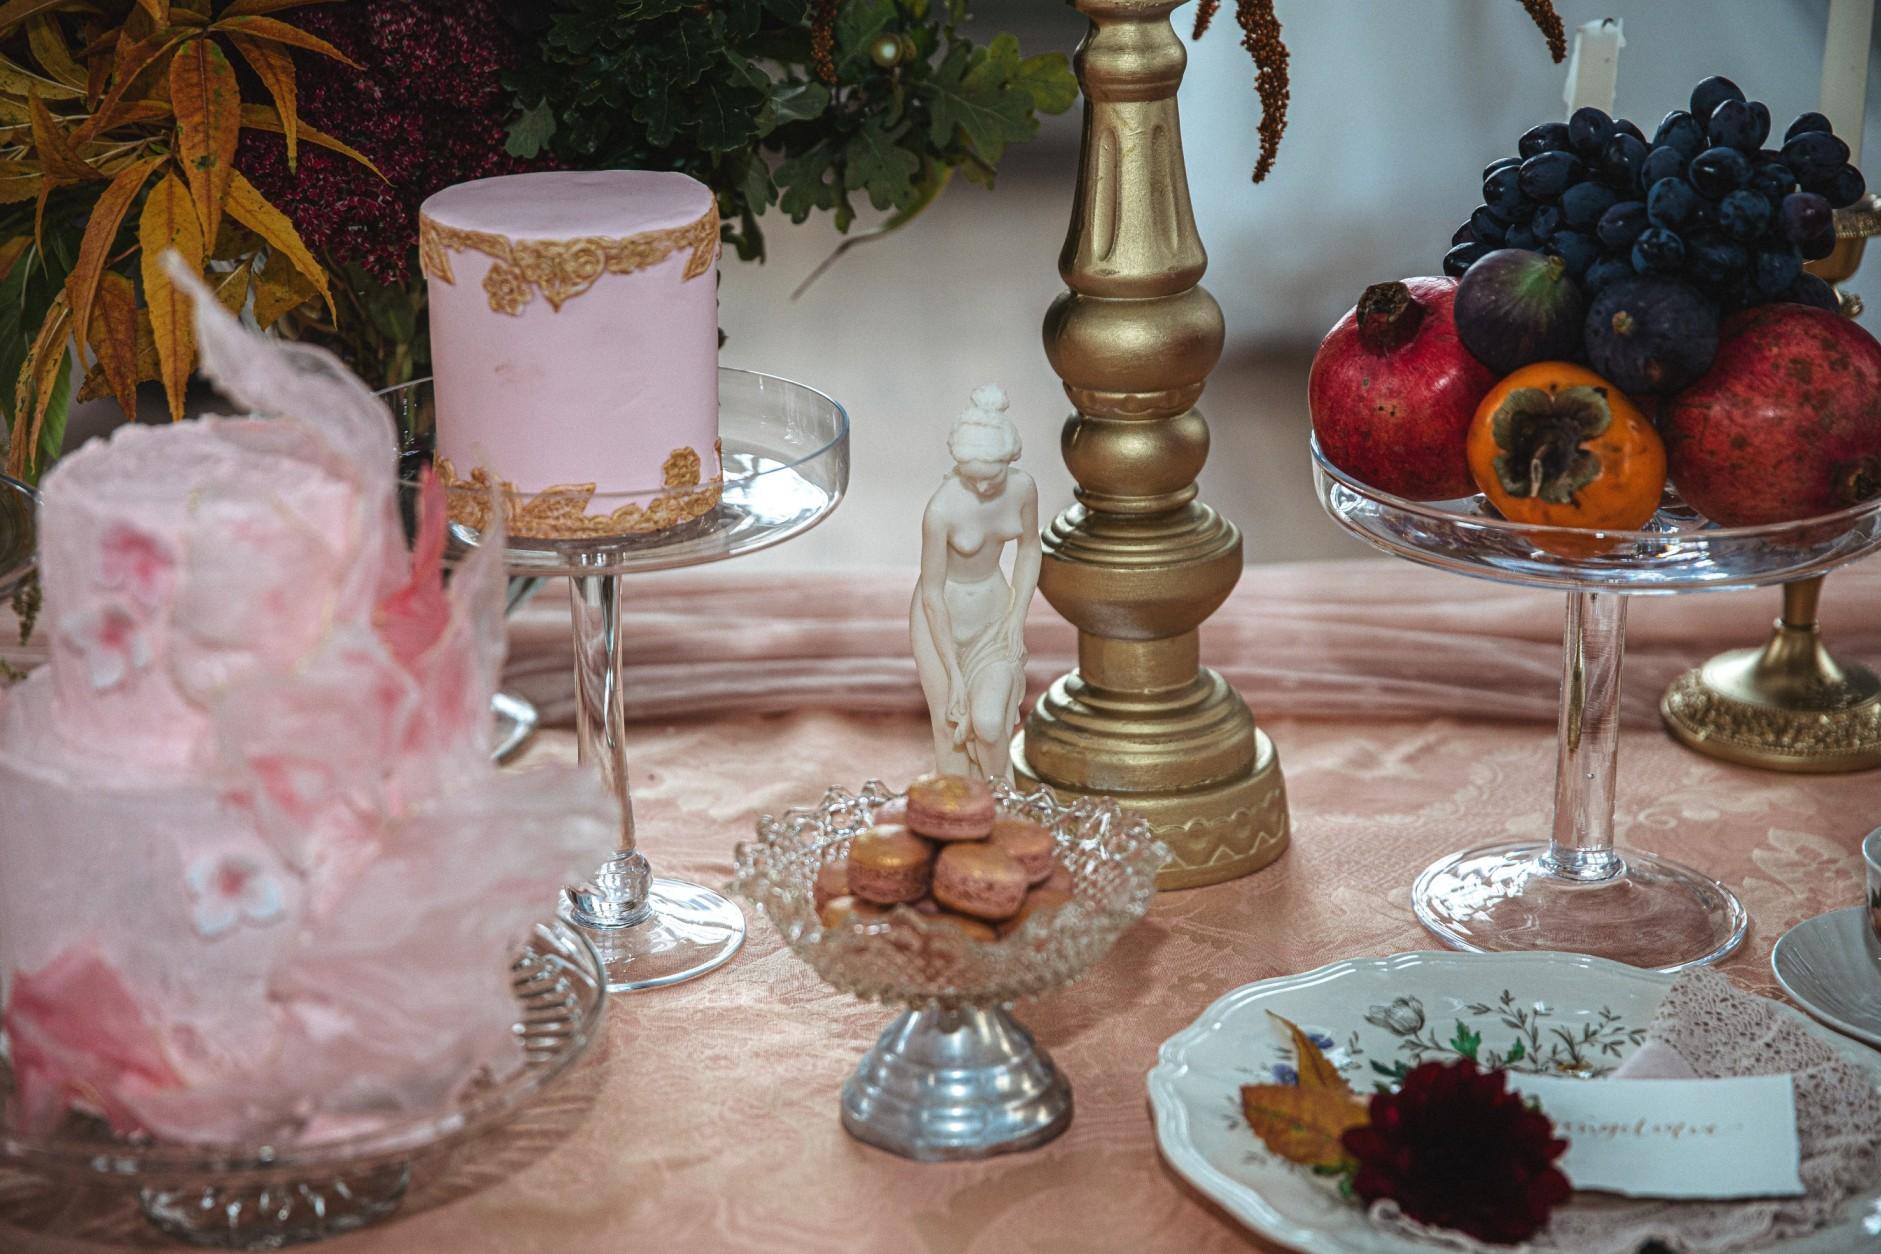 wedding dessert table - vinatge wedding dessert table - unique wedding desserts